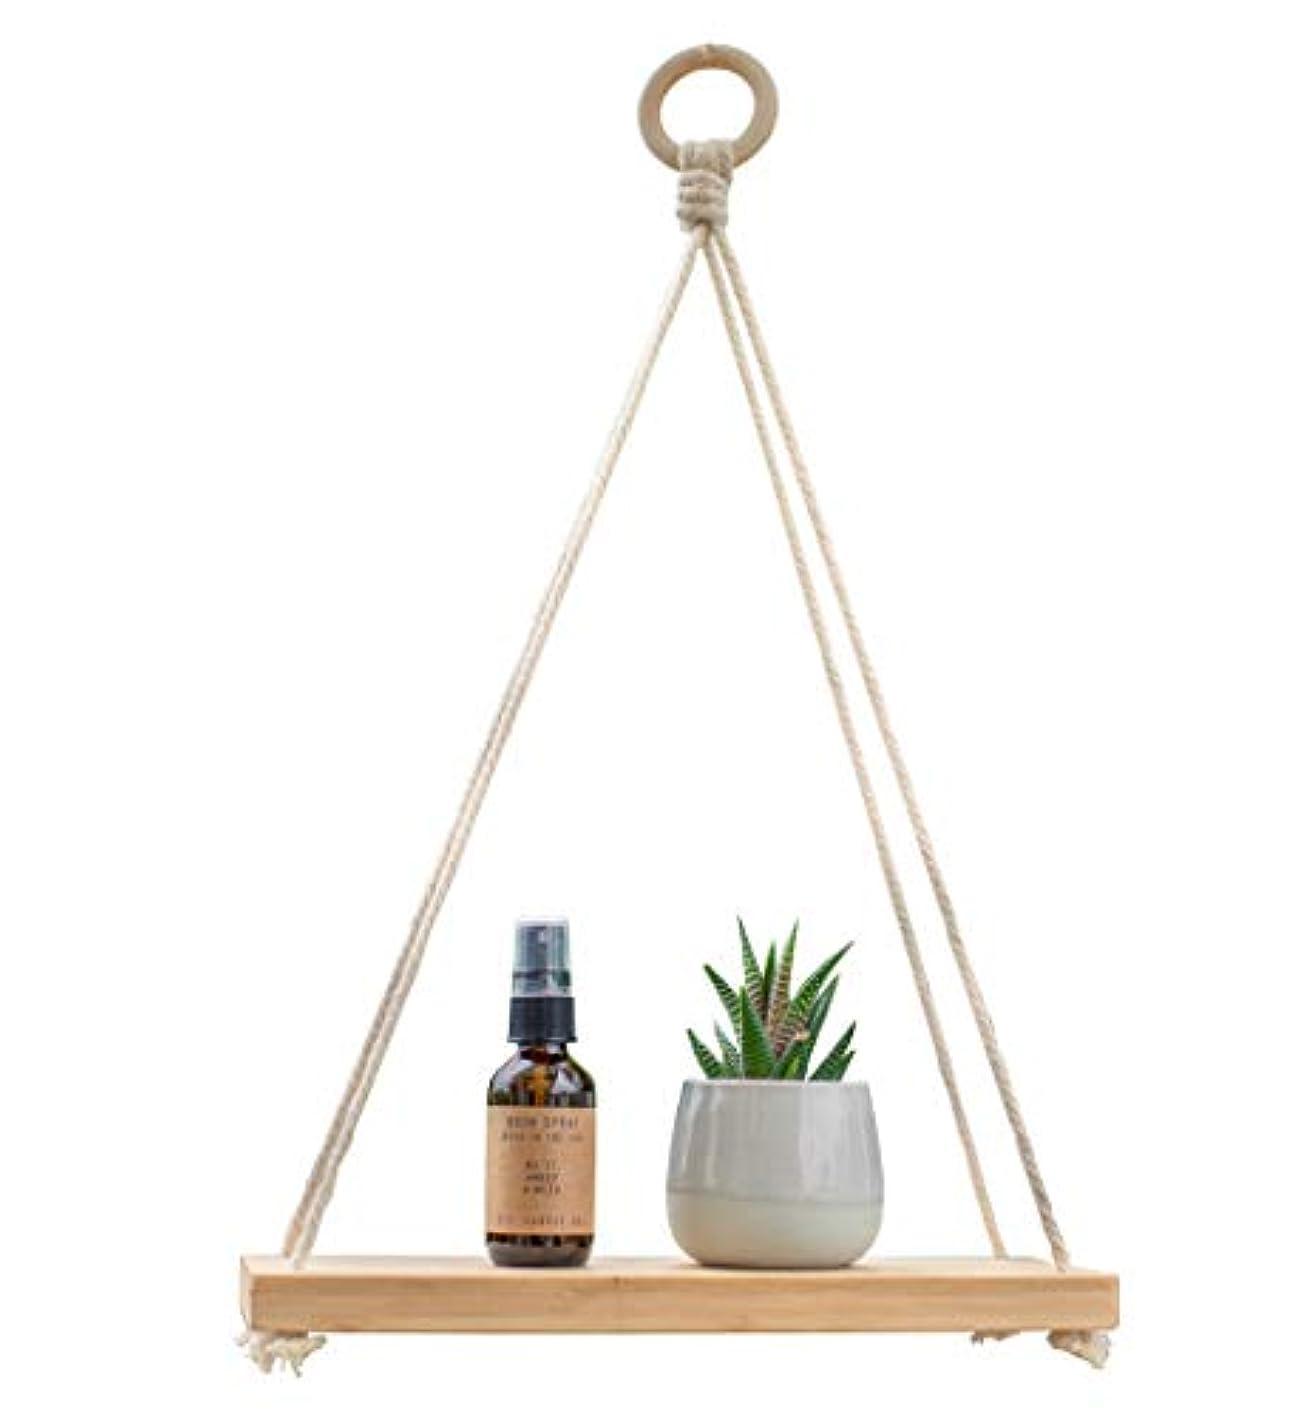 Macrame Pure Bamboo Hanging Plant Shelf Indoor Swing Rope Floating Shelf 12 Inches Eco Friendly